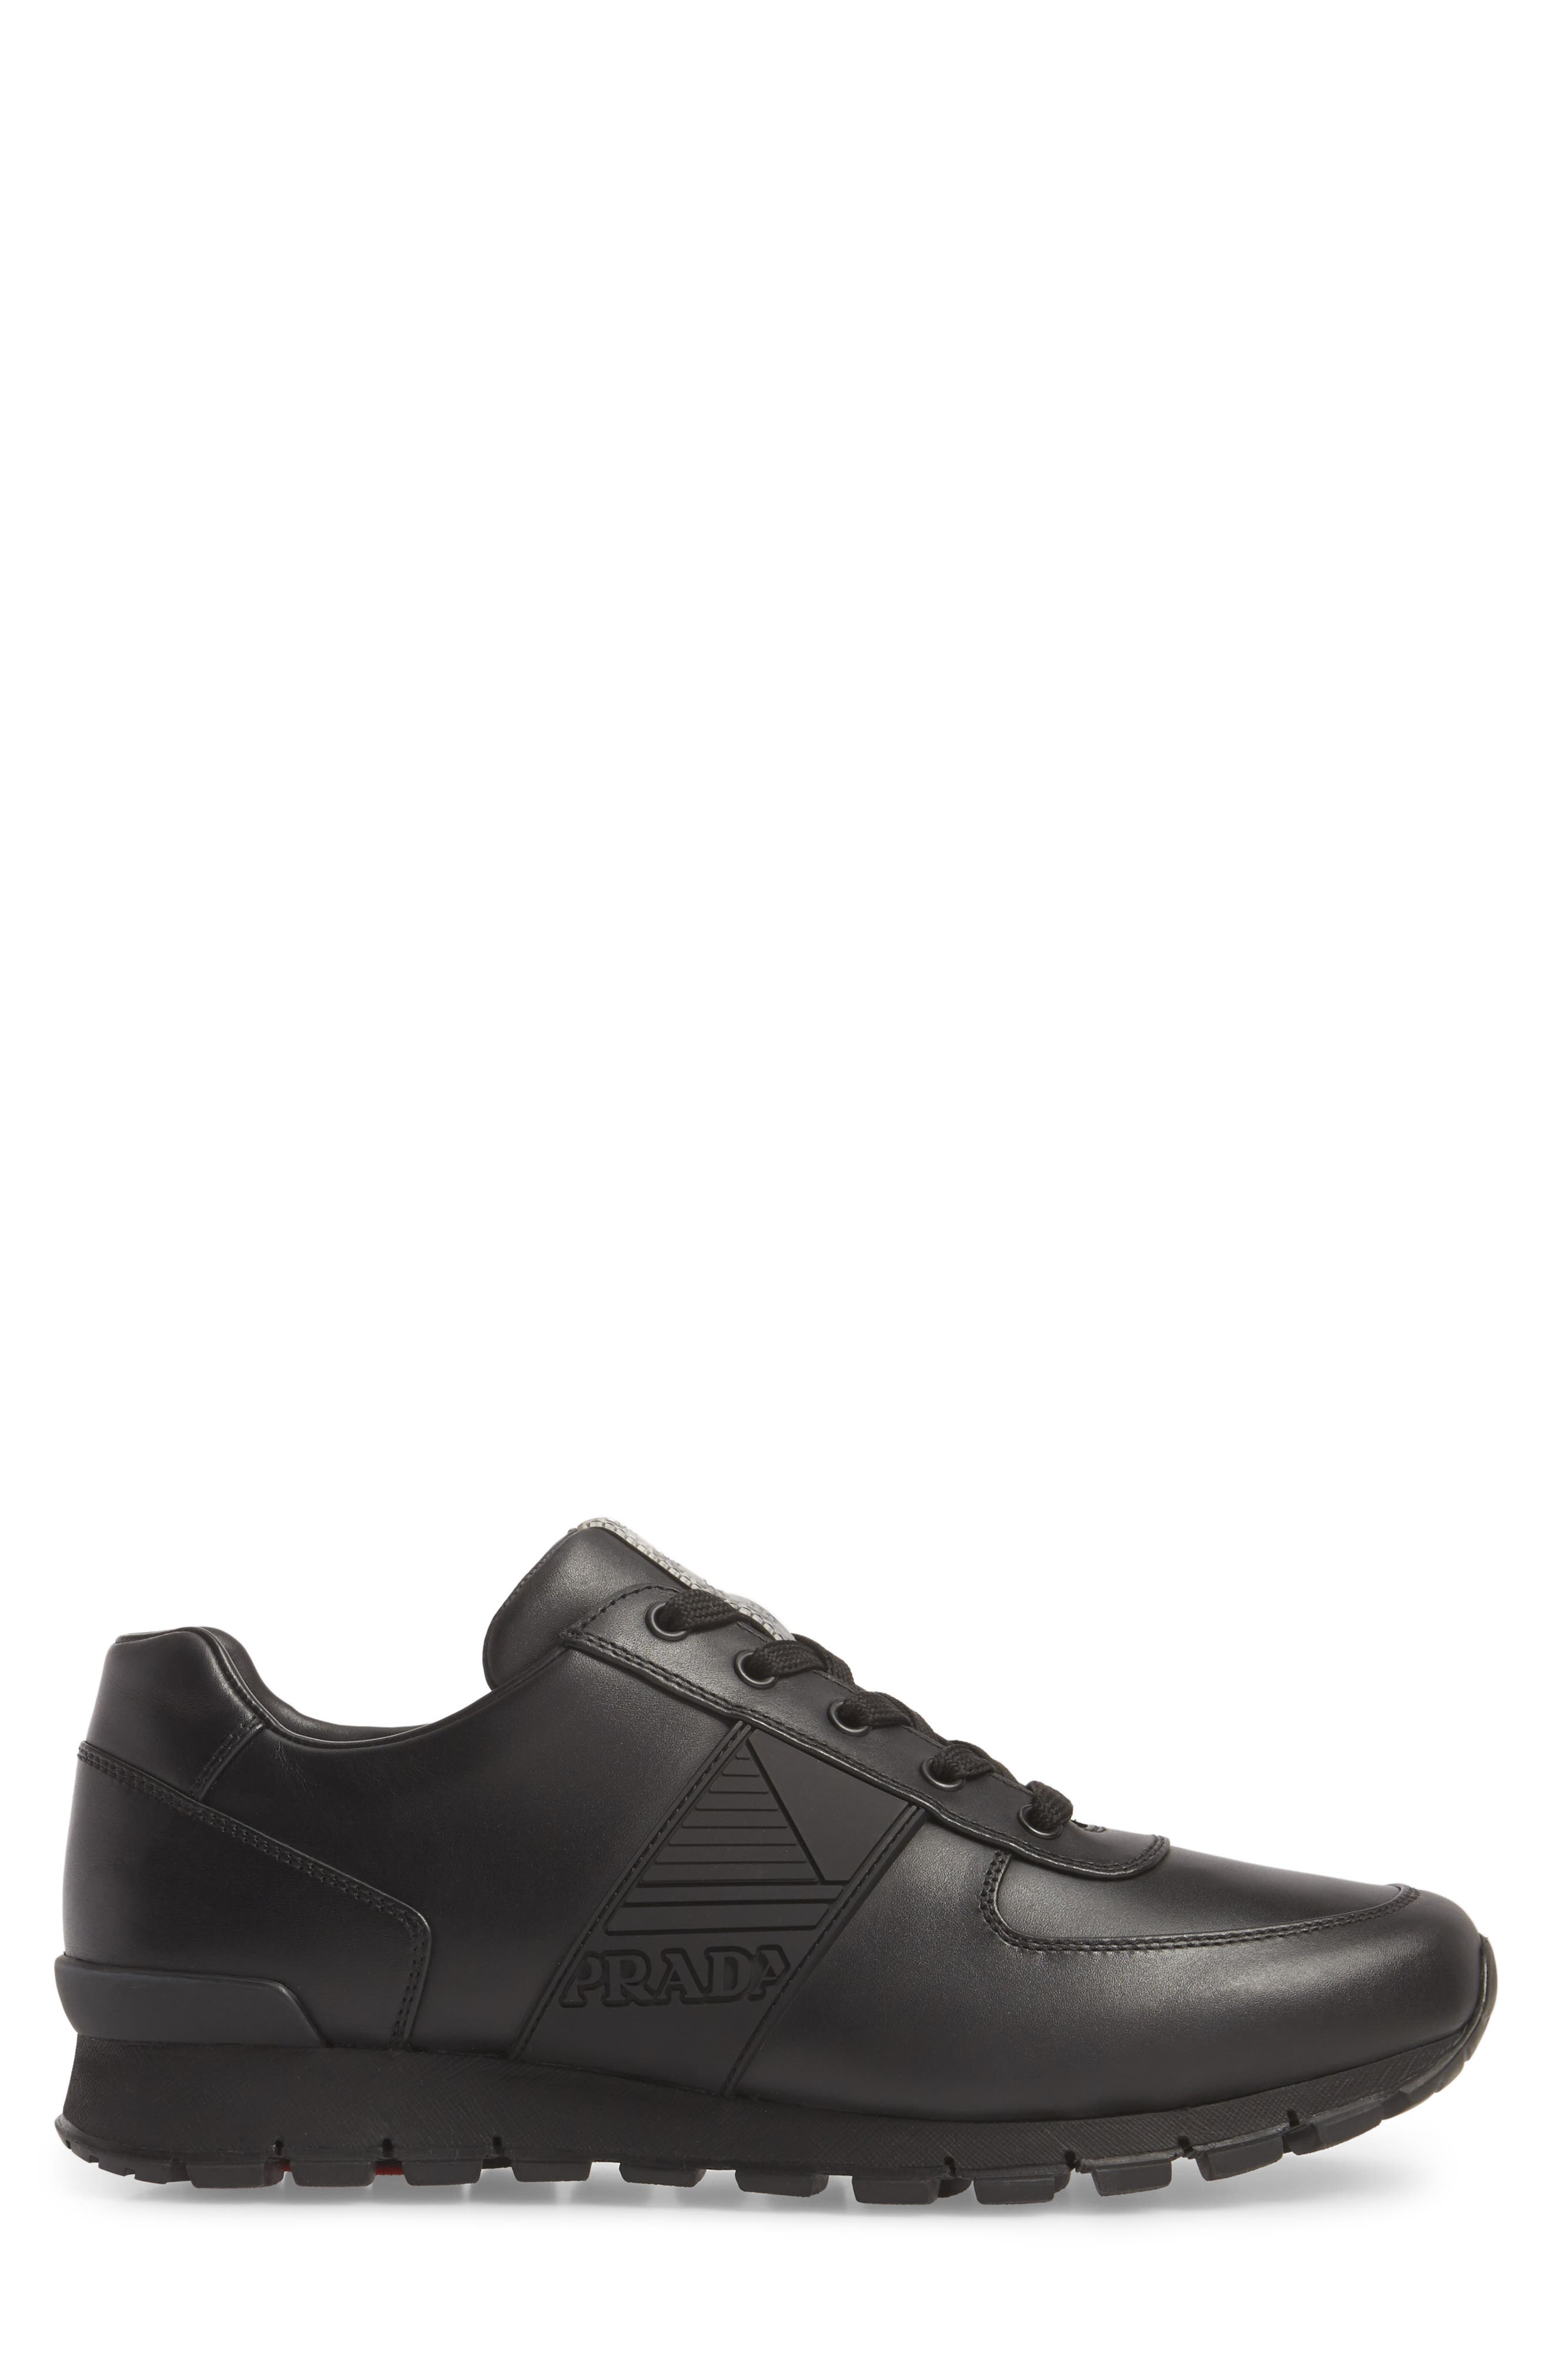 Linea Rossa Sneaker,                             Alternate thumbnail 3, color,                             NERO